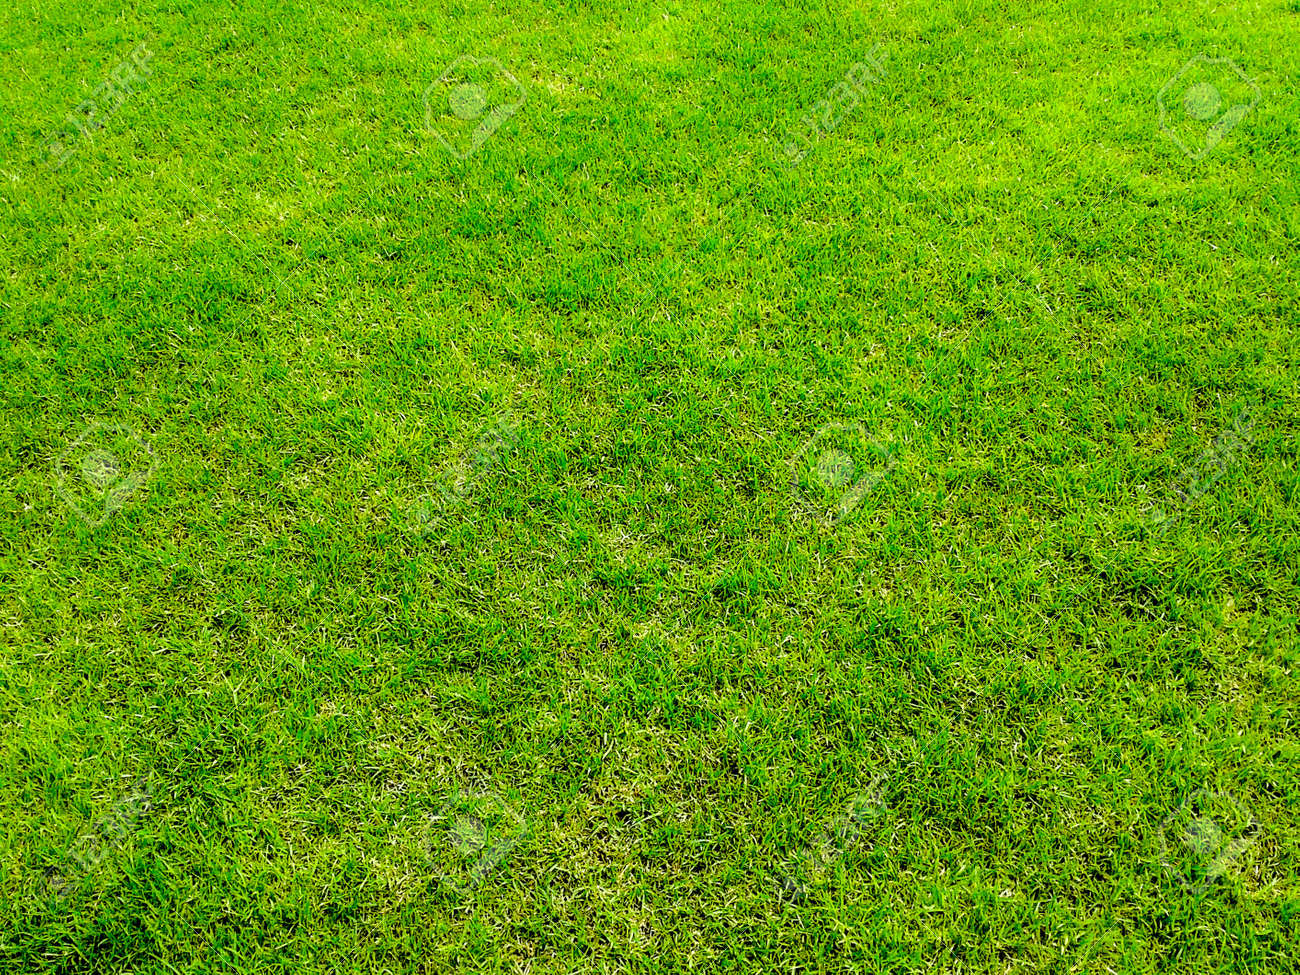 green grass surface ground Stock Photo - 21576444